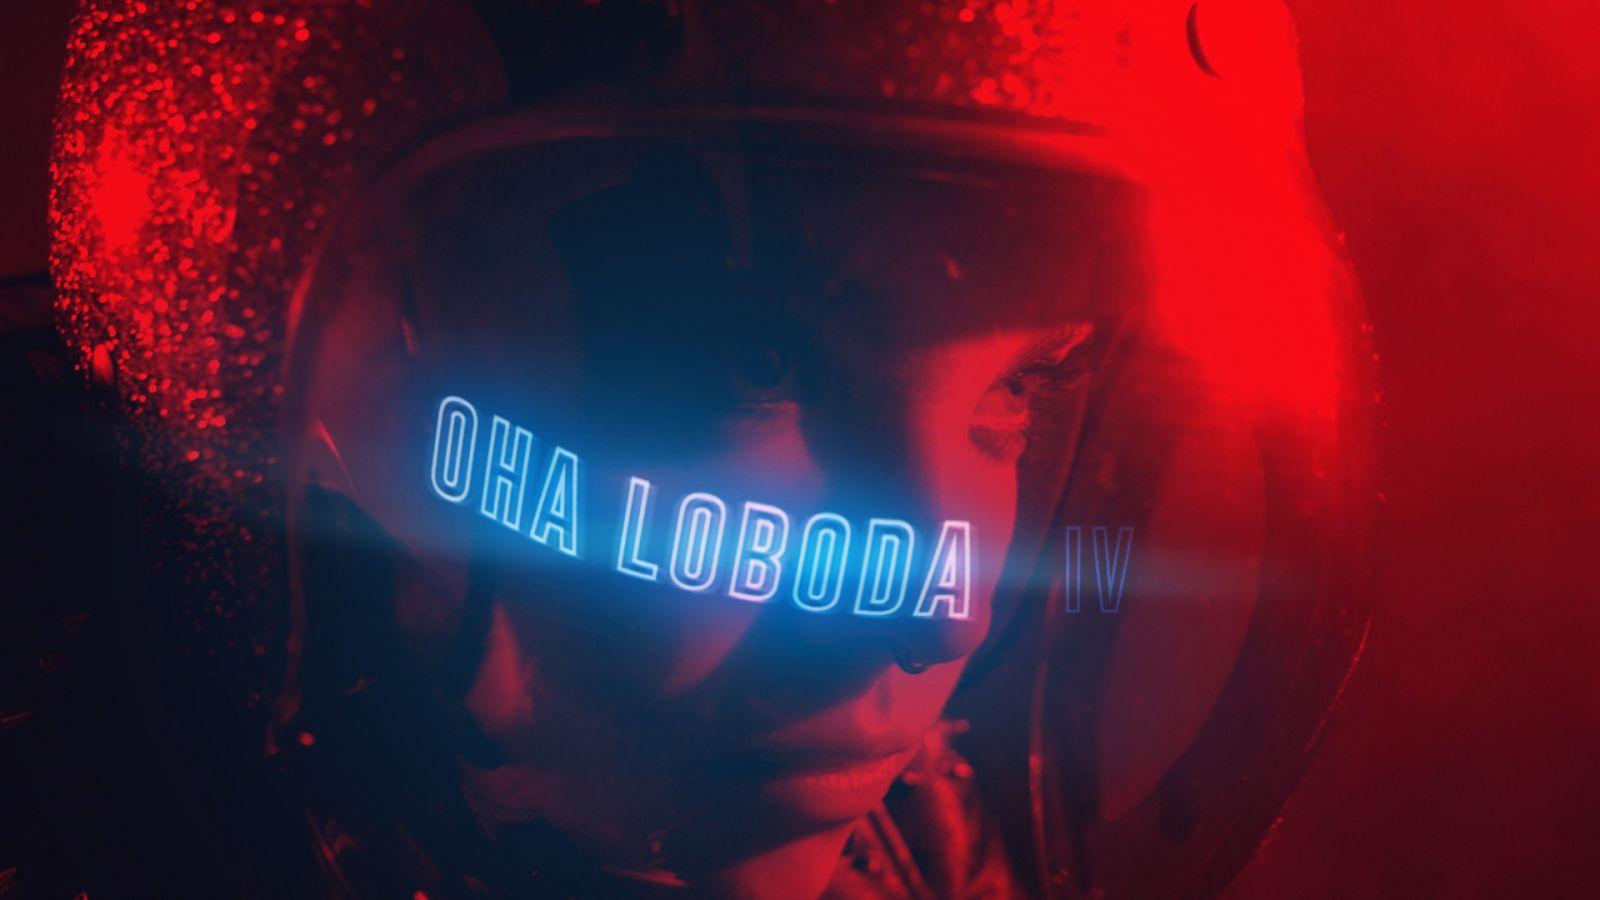 Loboda сняла смелый видеоролик